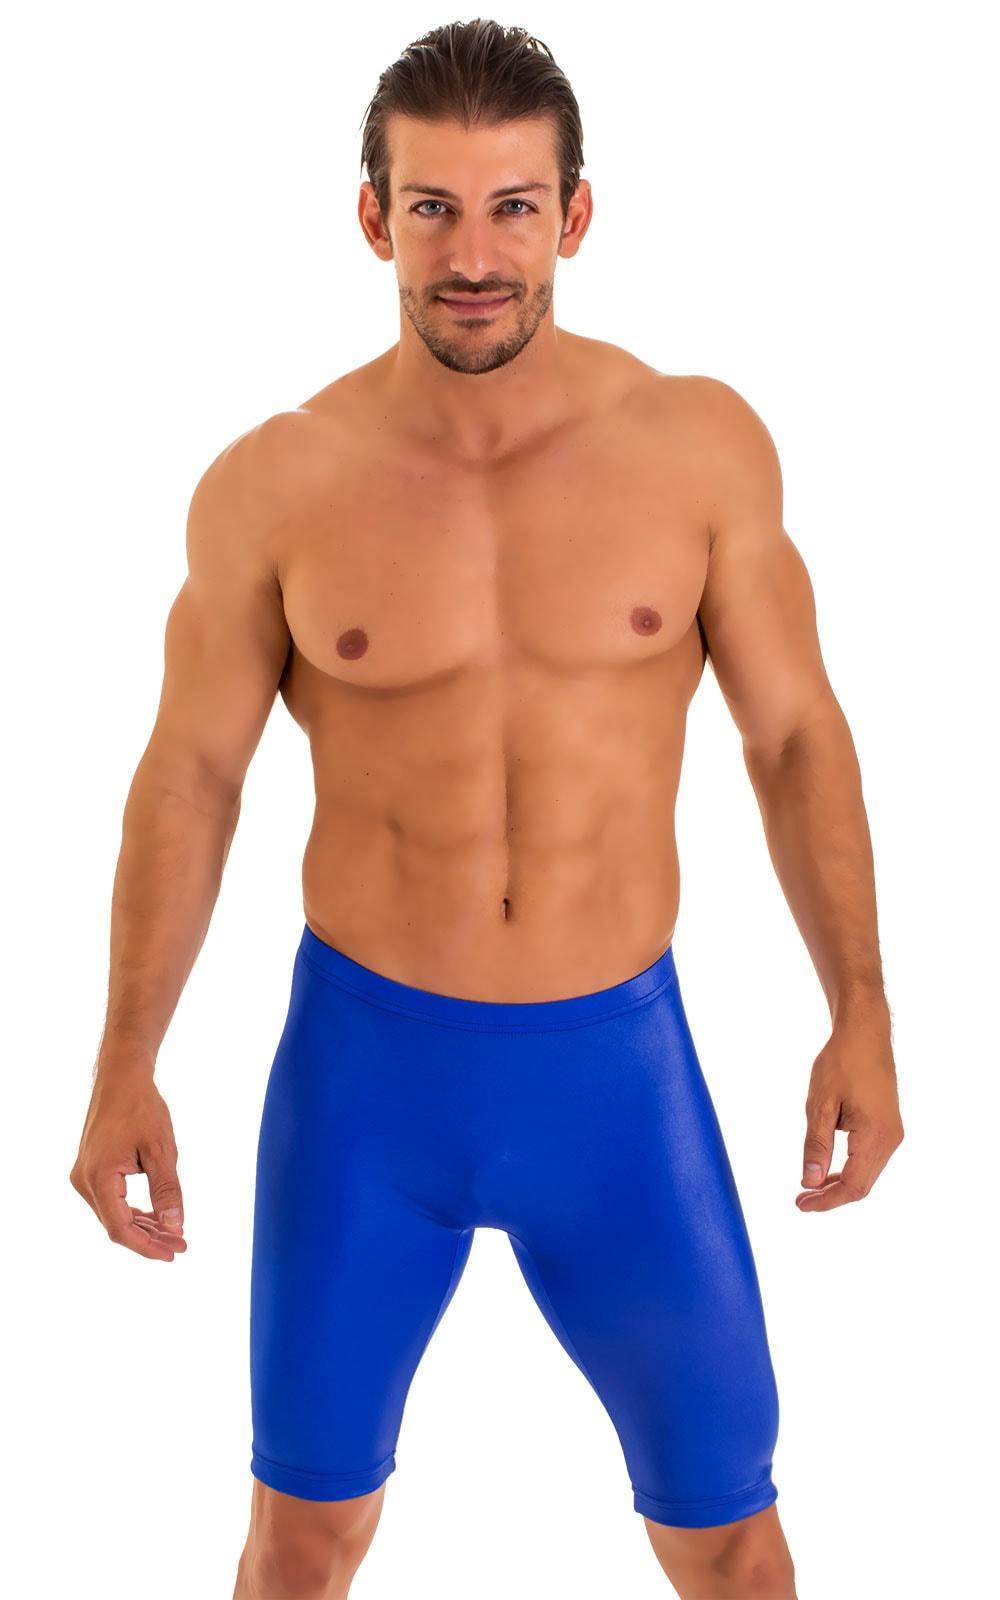 Lycra Bike Length Shorts in Wet Look Royal Blue 1